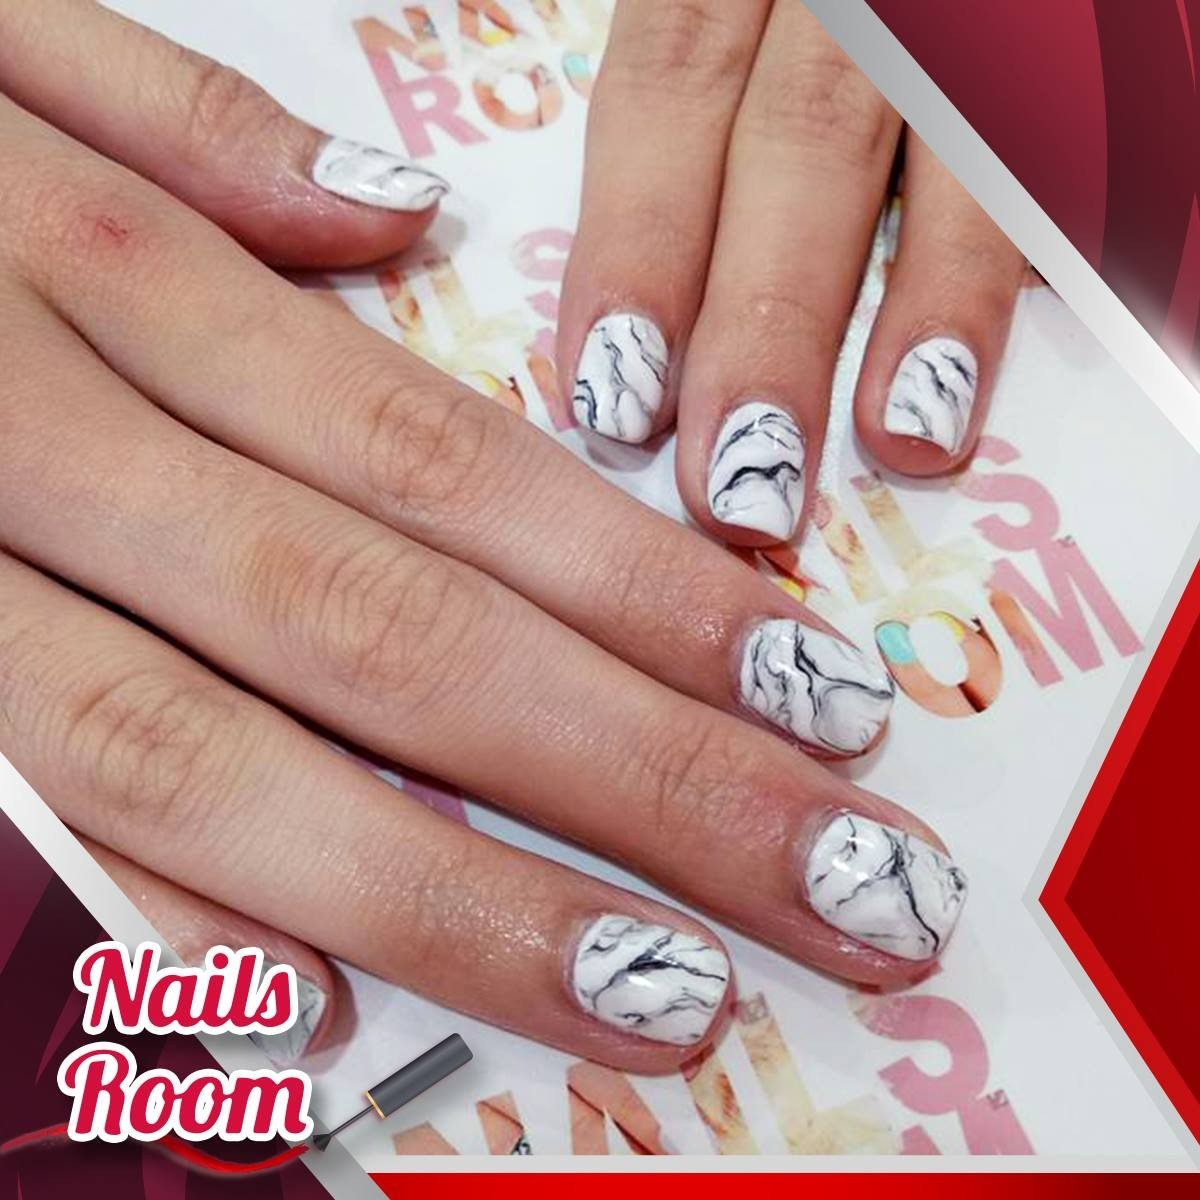 Nails Room BTS พระโขนง